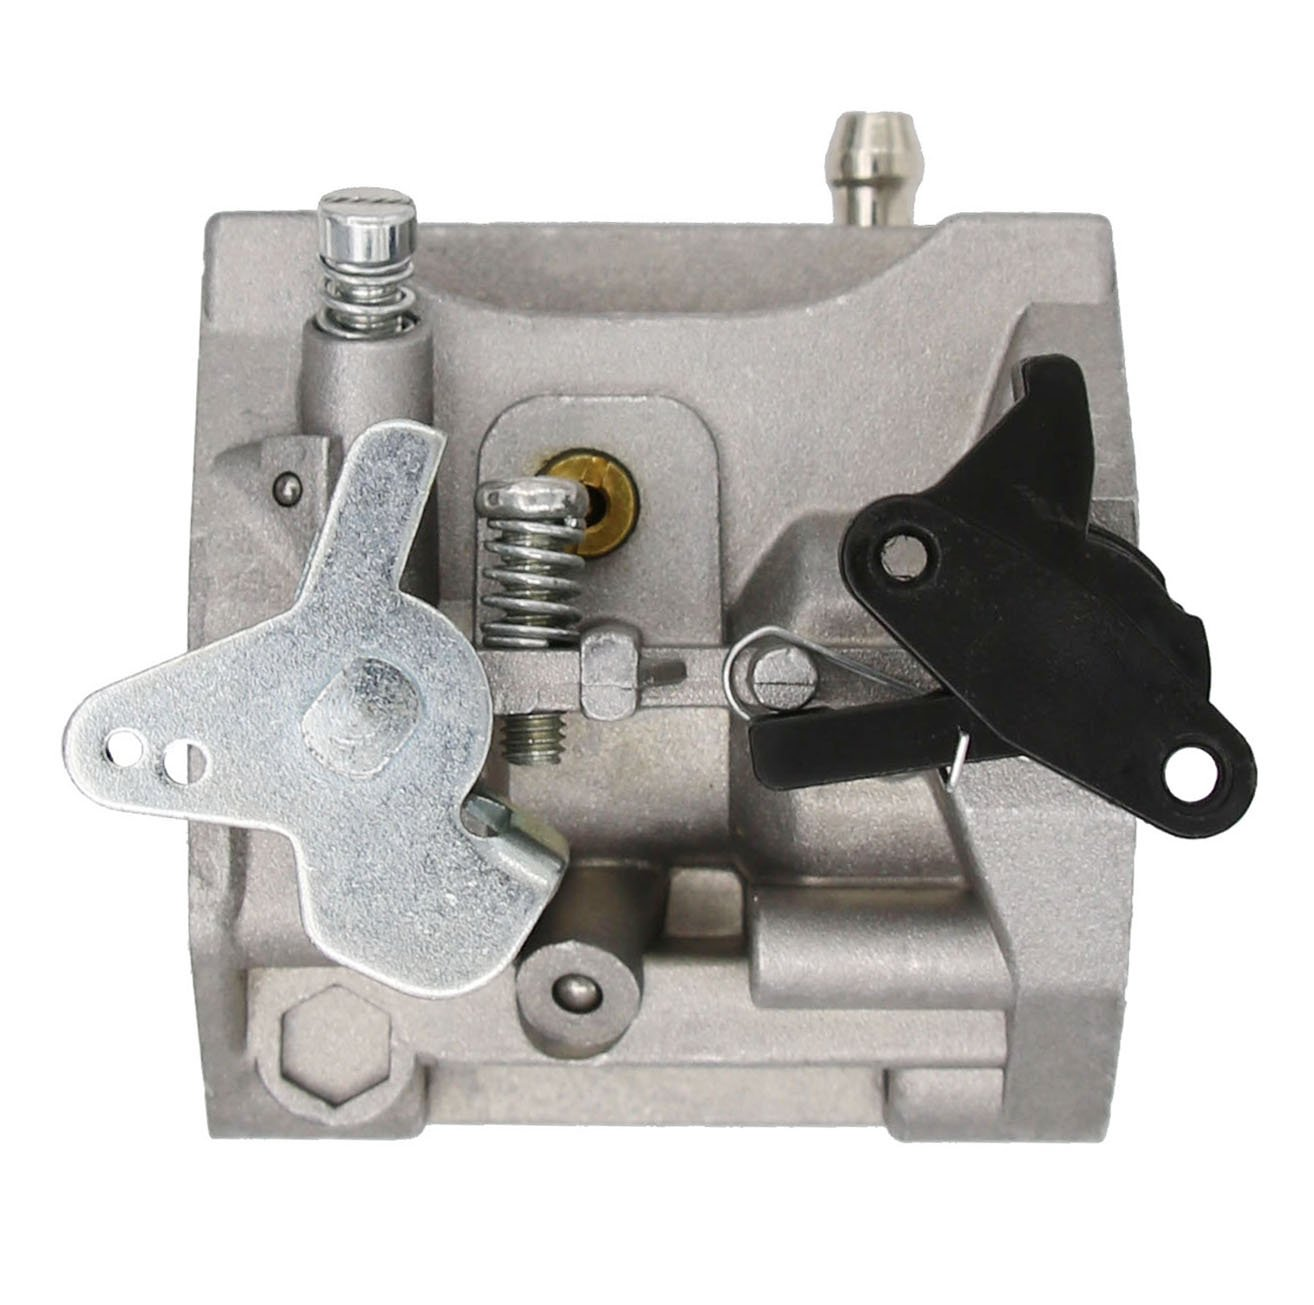 Gcv160 Carburetor For Honda Hrt216 Hrr216 Gcv160a Hrs216 Diagram Of All Years R1a Small Engine Garden Outdoor